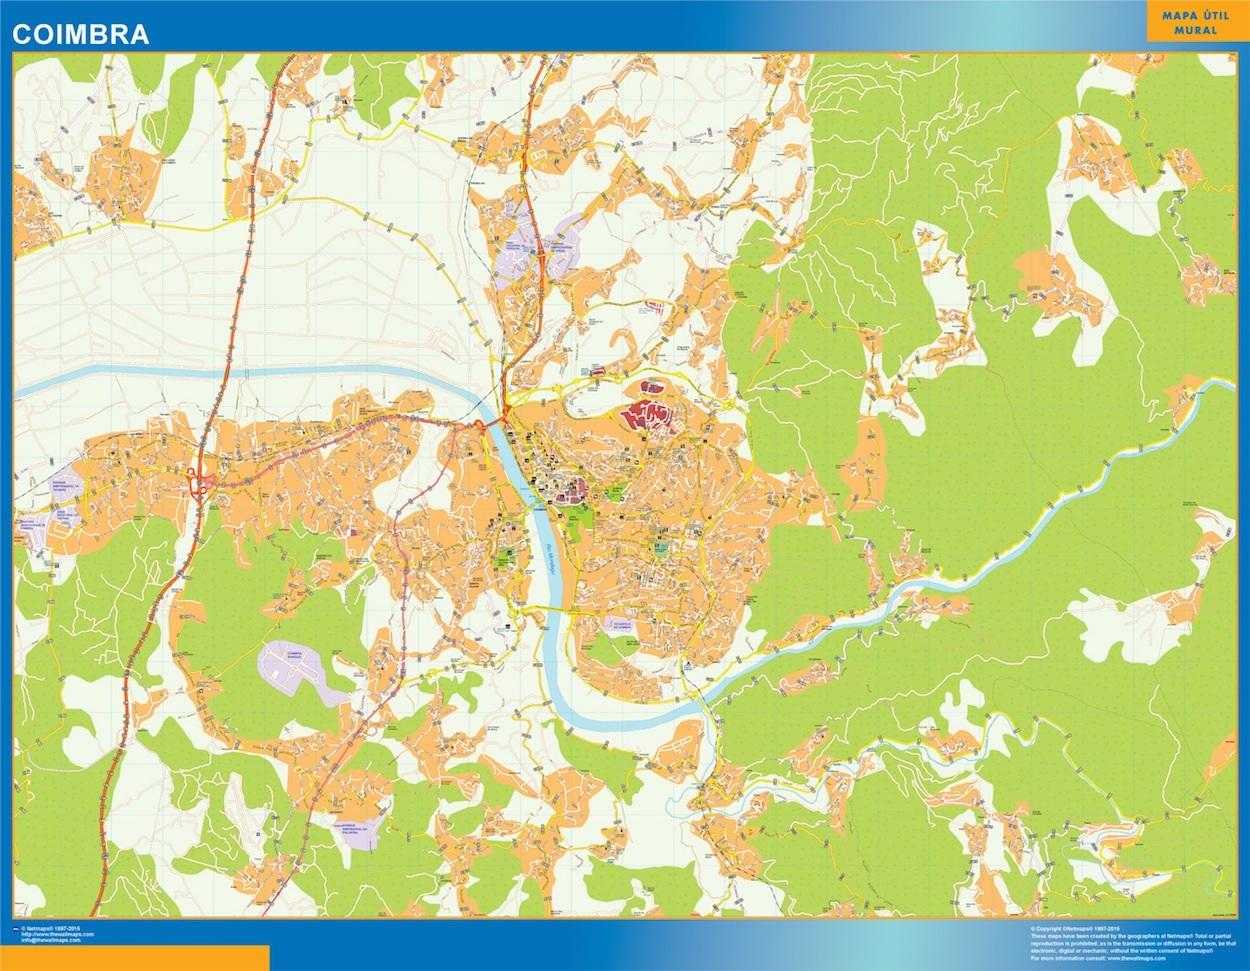 Mapa Coimbra en Portugal plastificado gigante